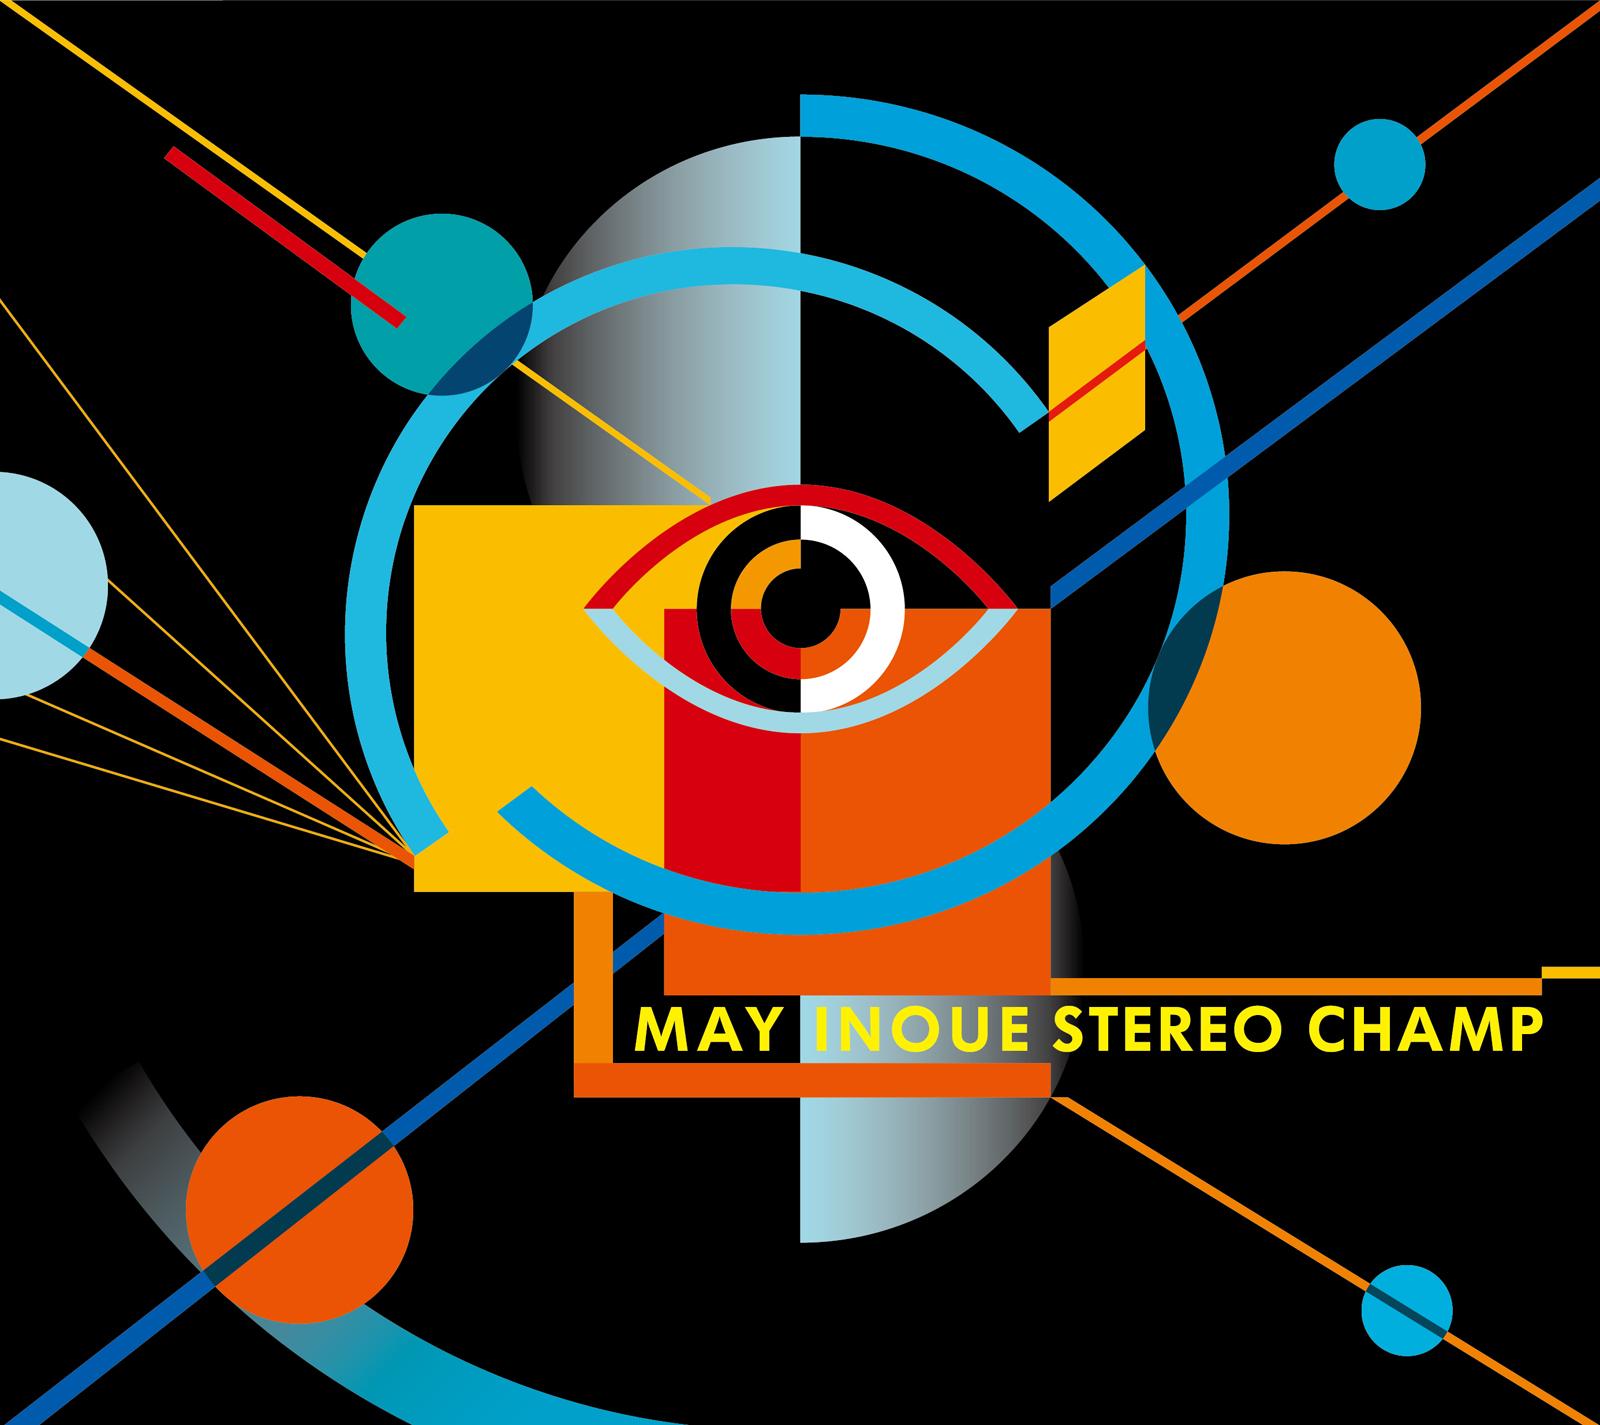 May Inoue「Stereo Champ」